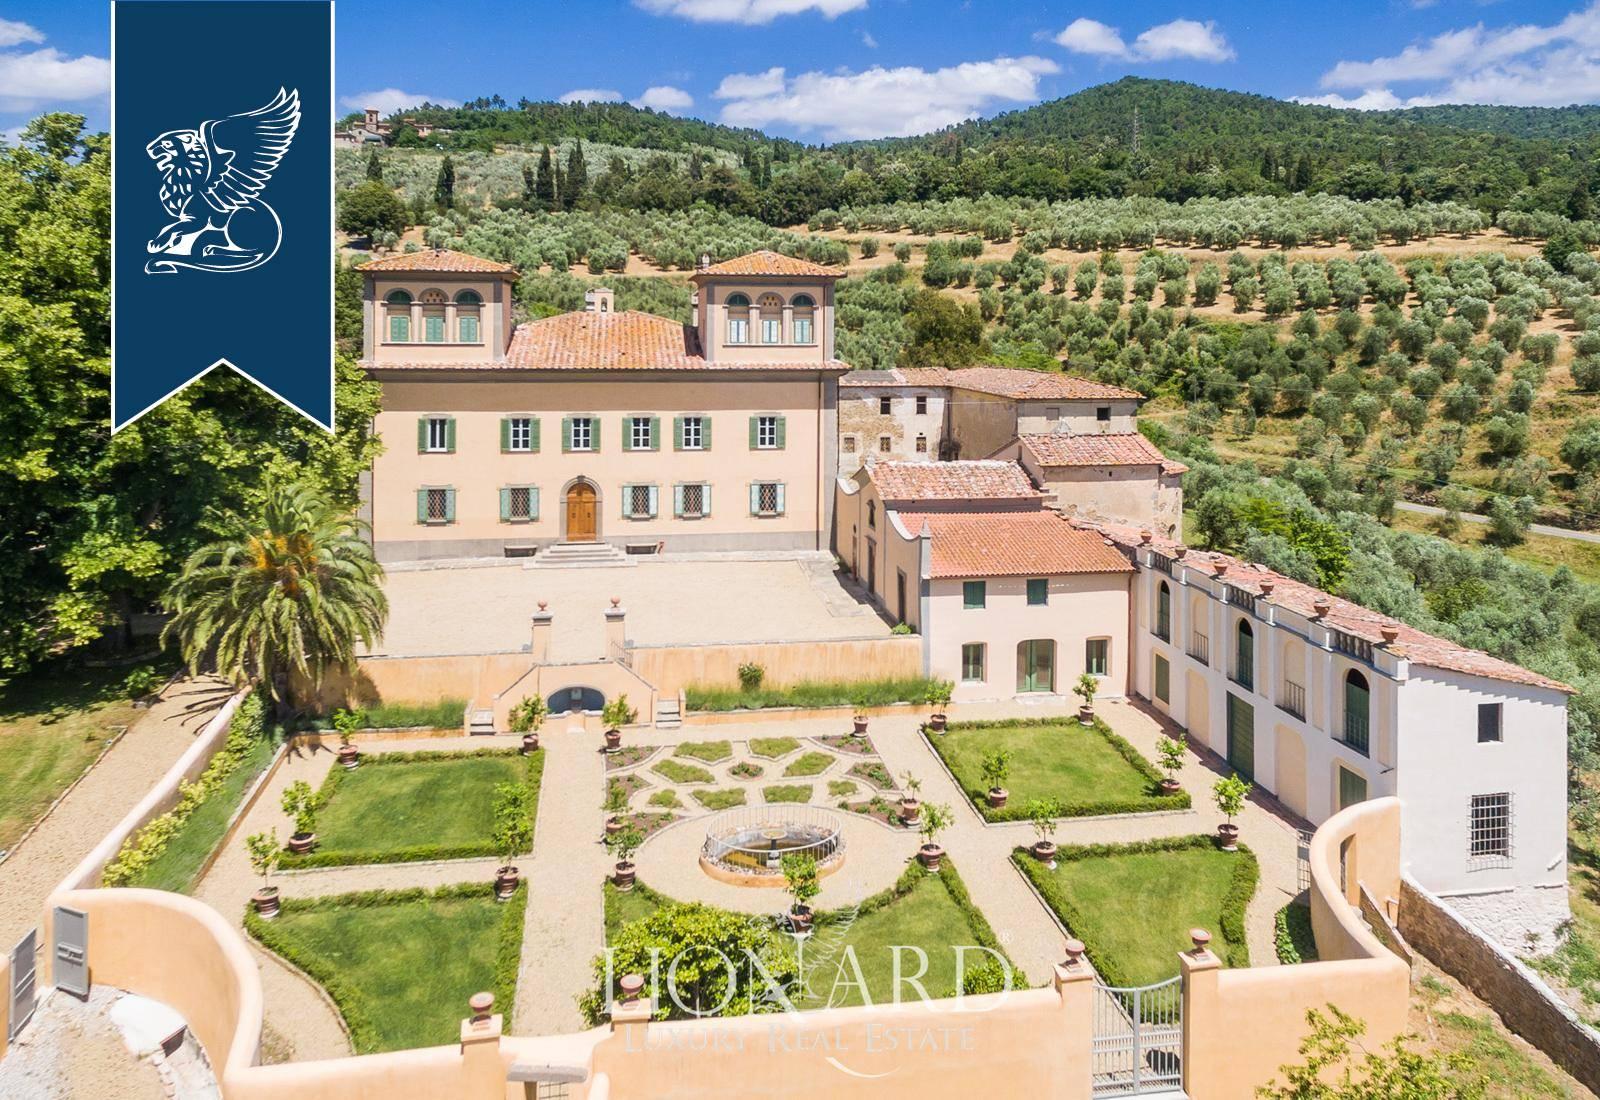 Villa in Vendita a Vinci: 0 locali, 5246 mq - Foto 8